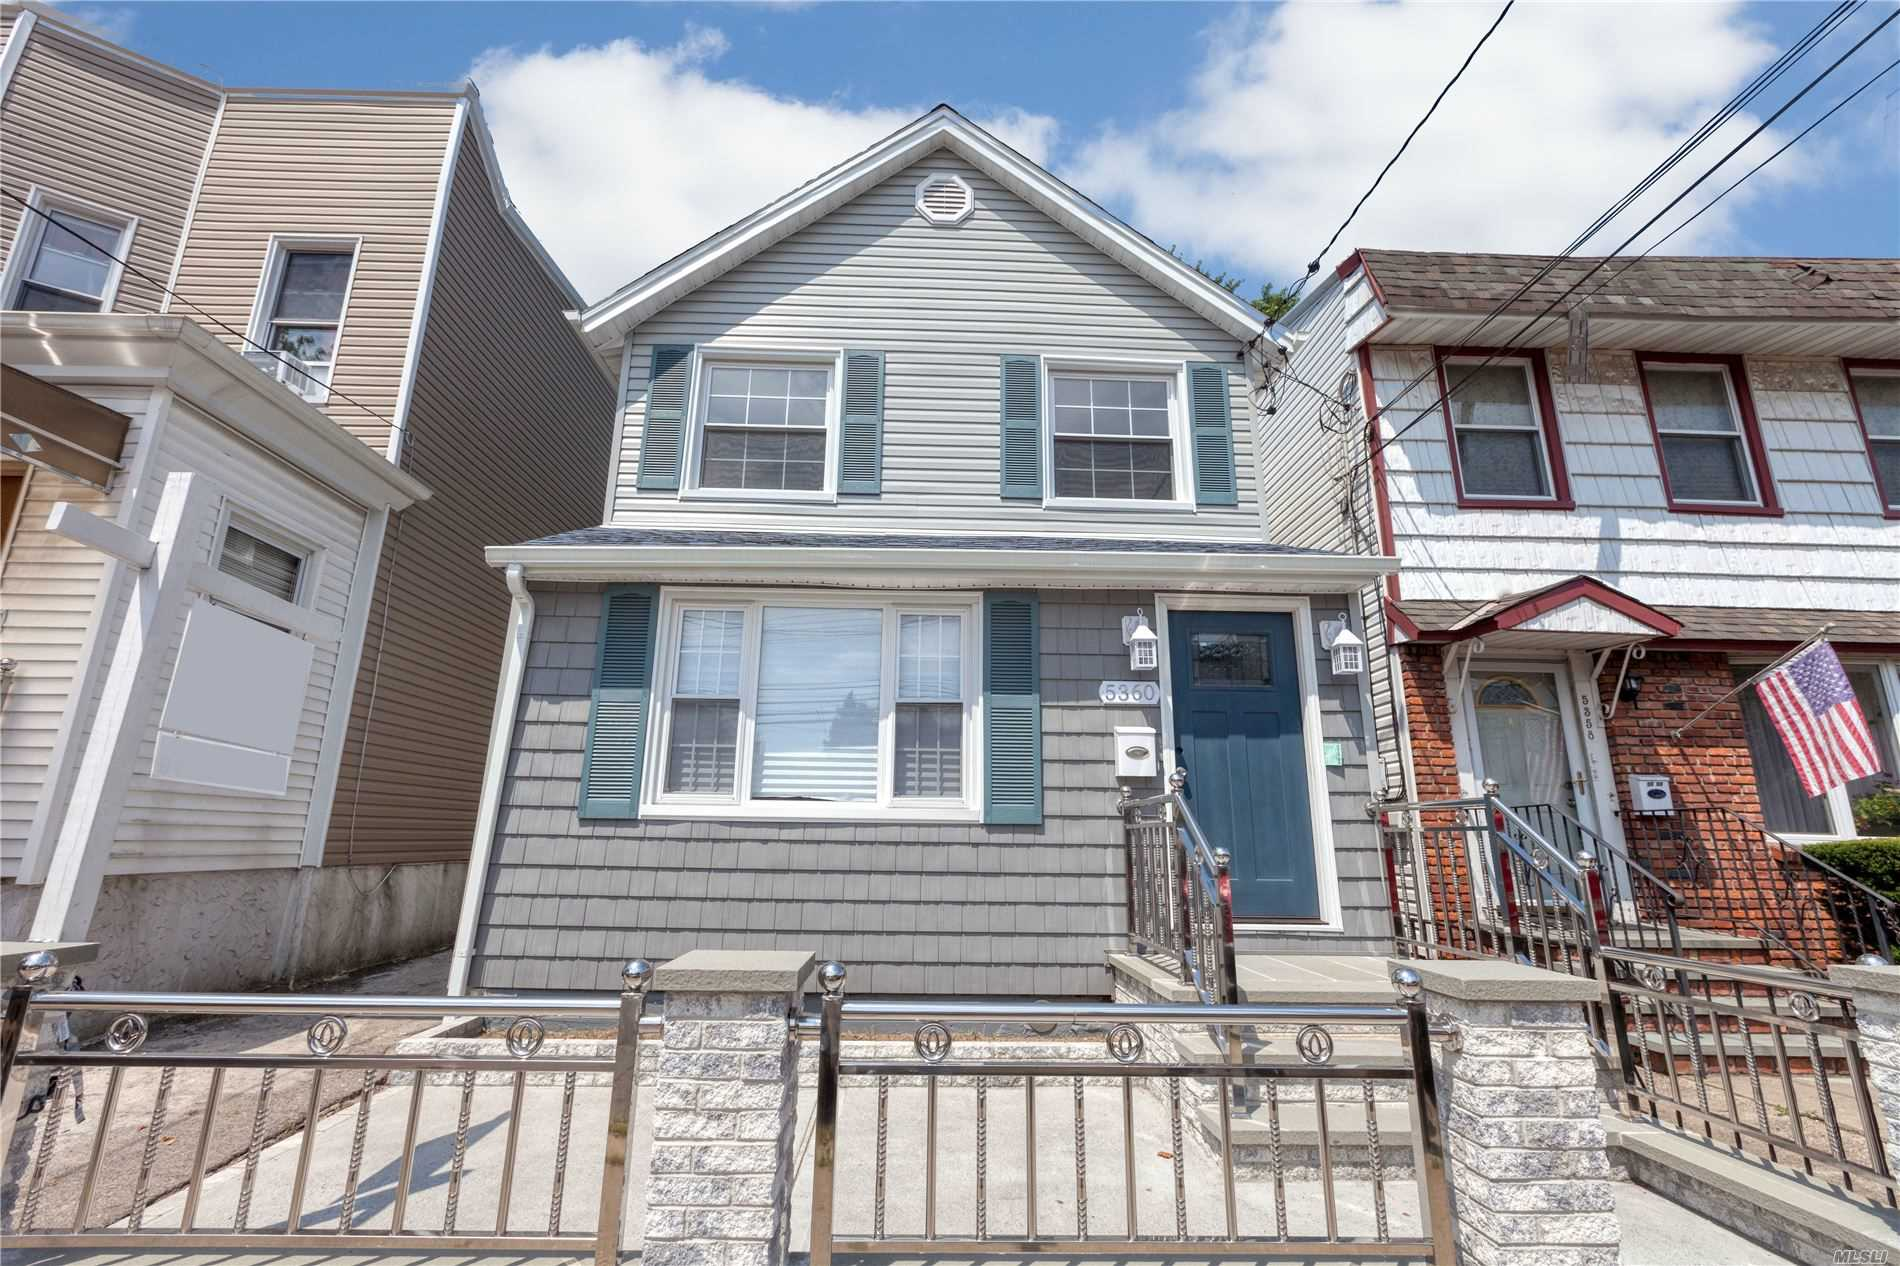 Property for sale at 53-60 72 Street, Maspeth NY 11378, Maspeth,  New York 11378